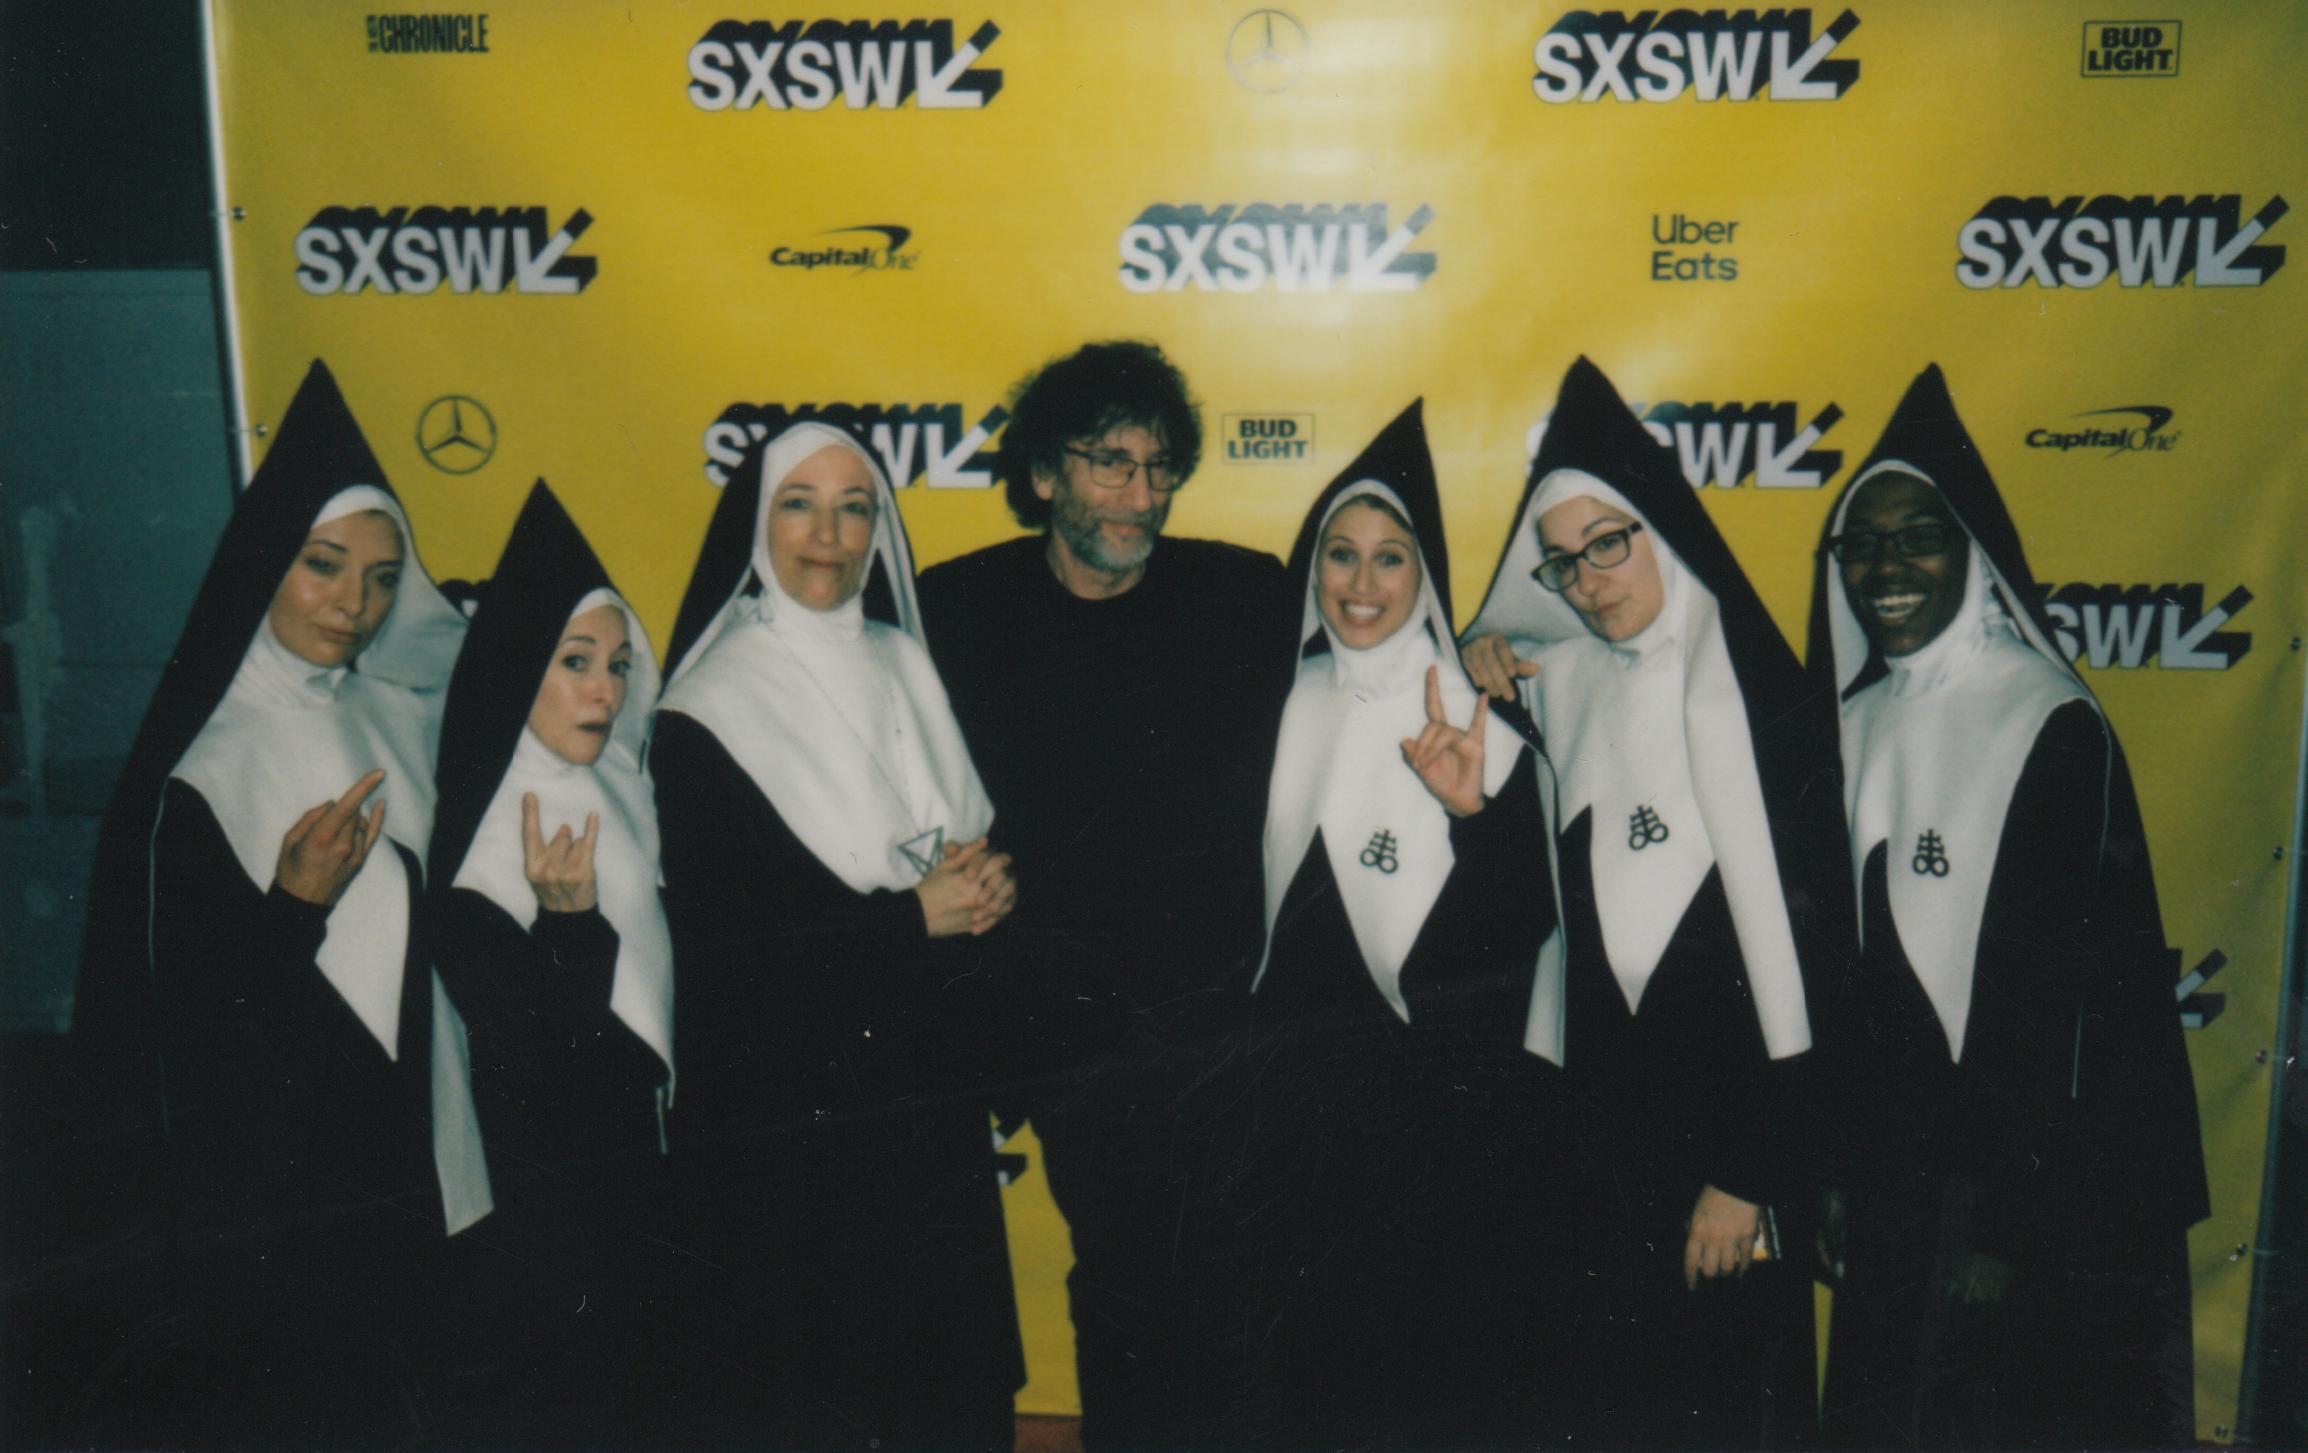 4 Good omens chattering nuns hal kirkland.png